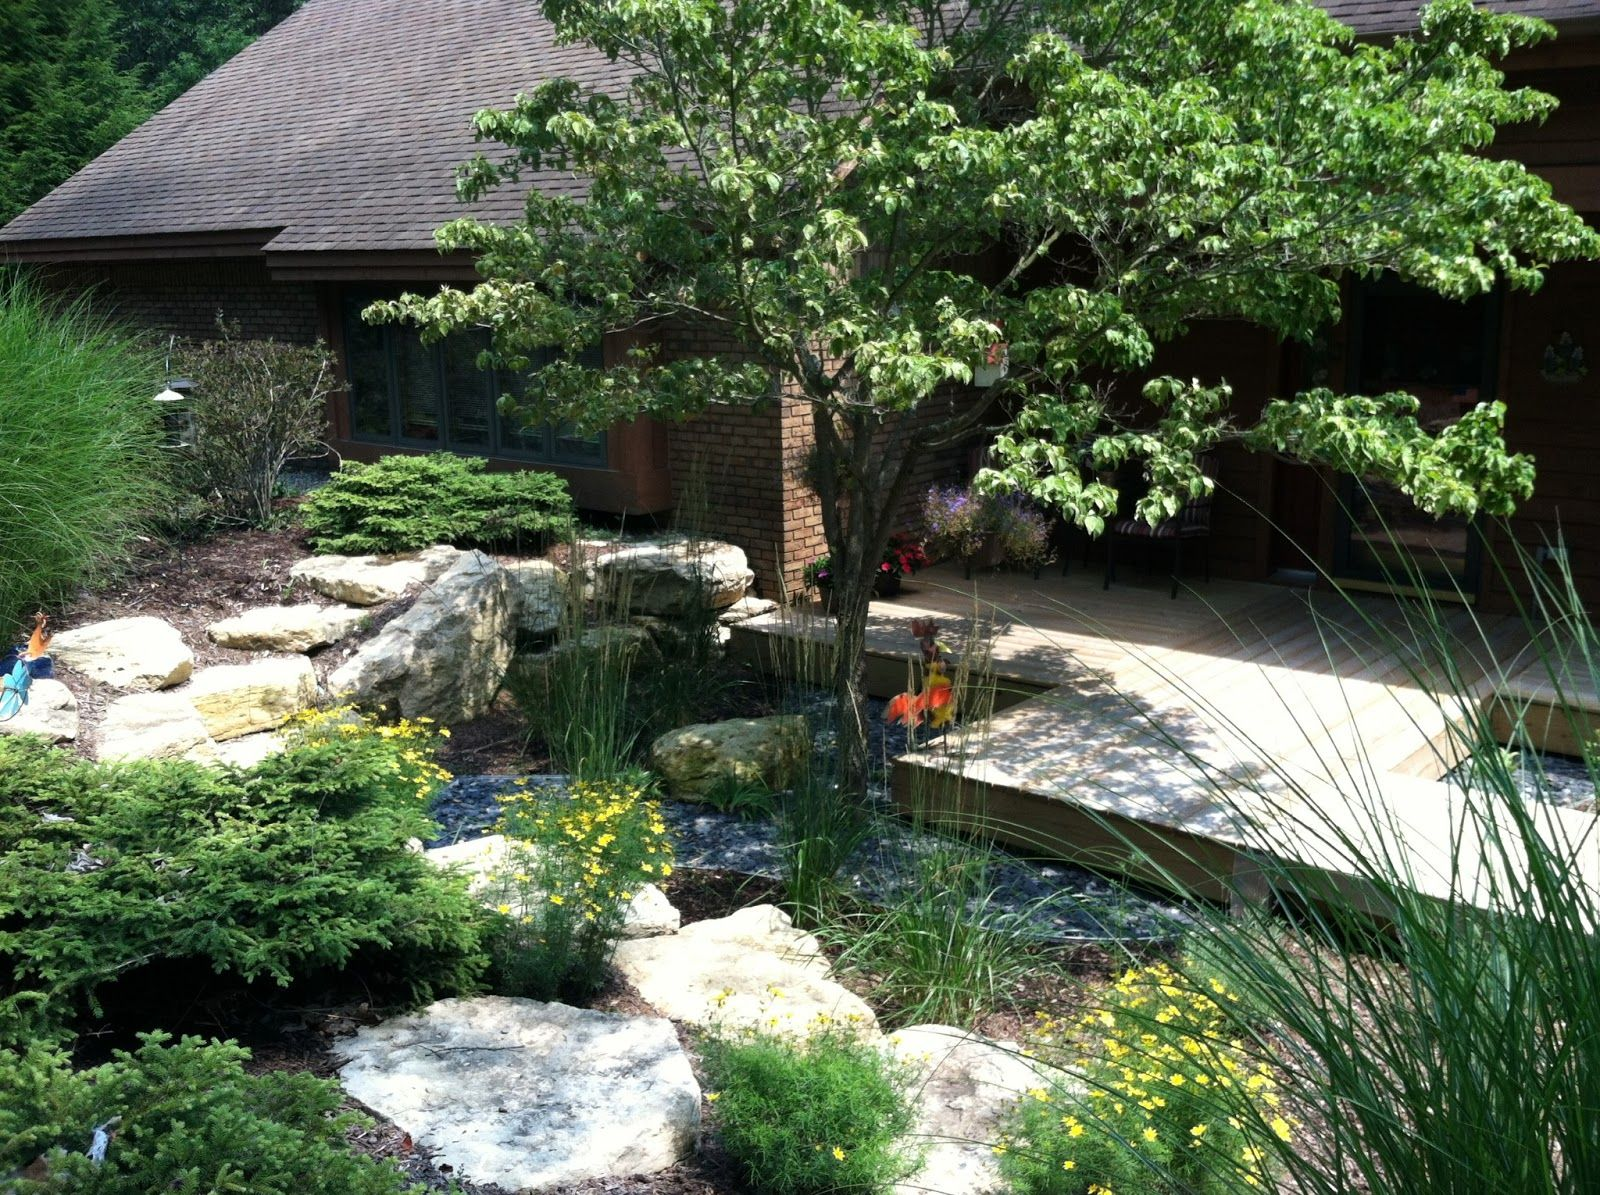 Medium Crop Of Amazing Backyard Designs